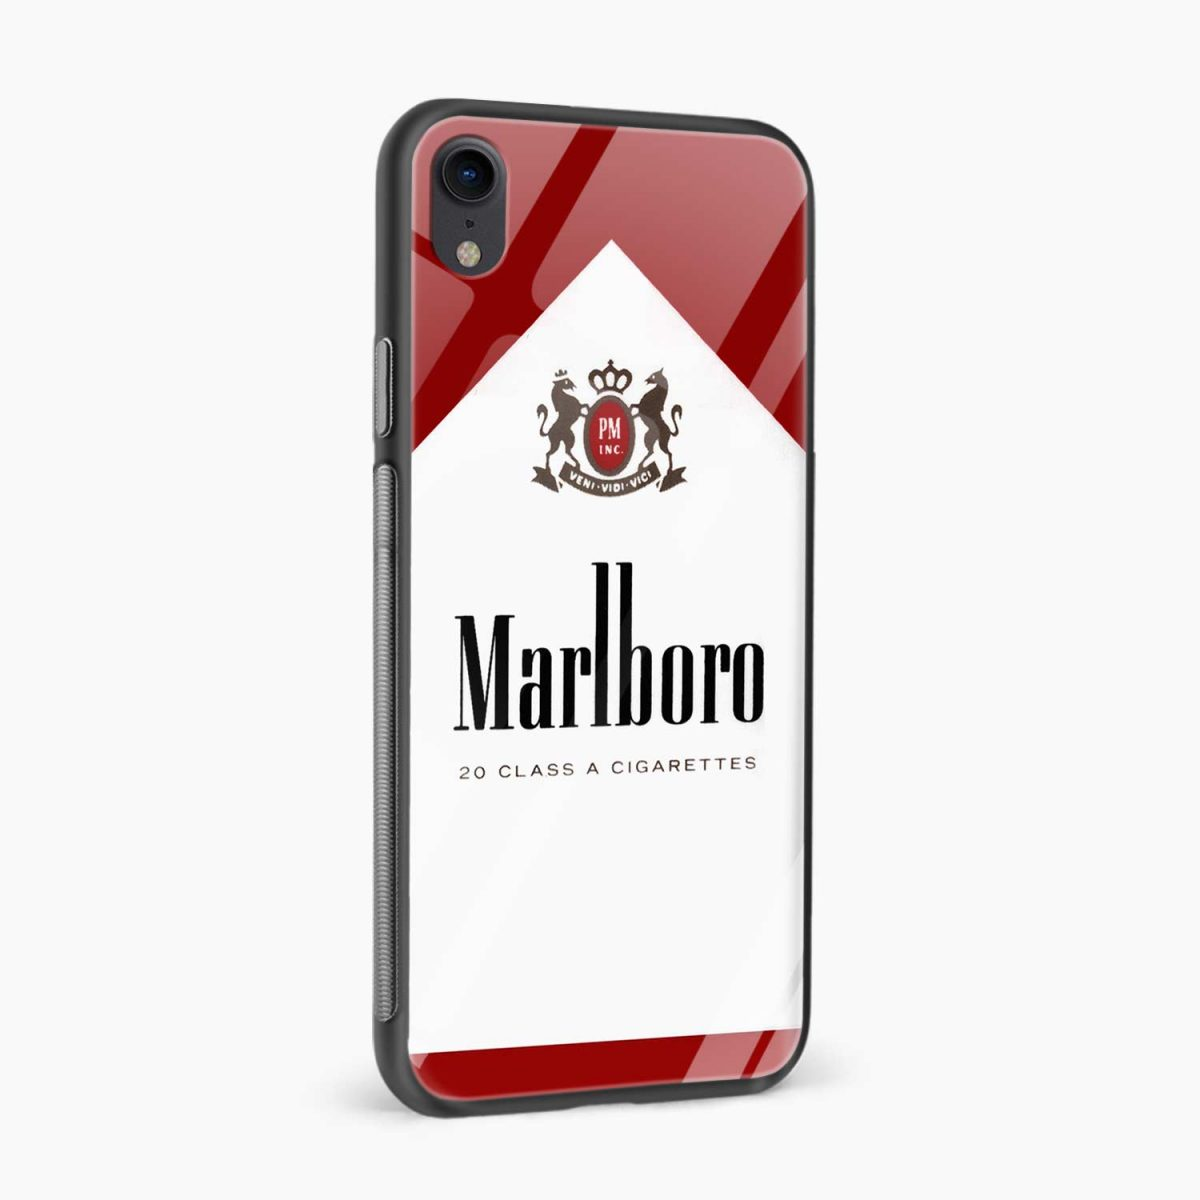 marlboro cigarette box apple iphone xr back cover side view